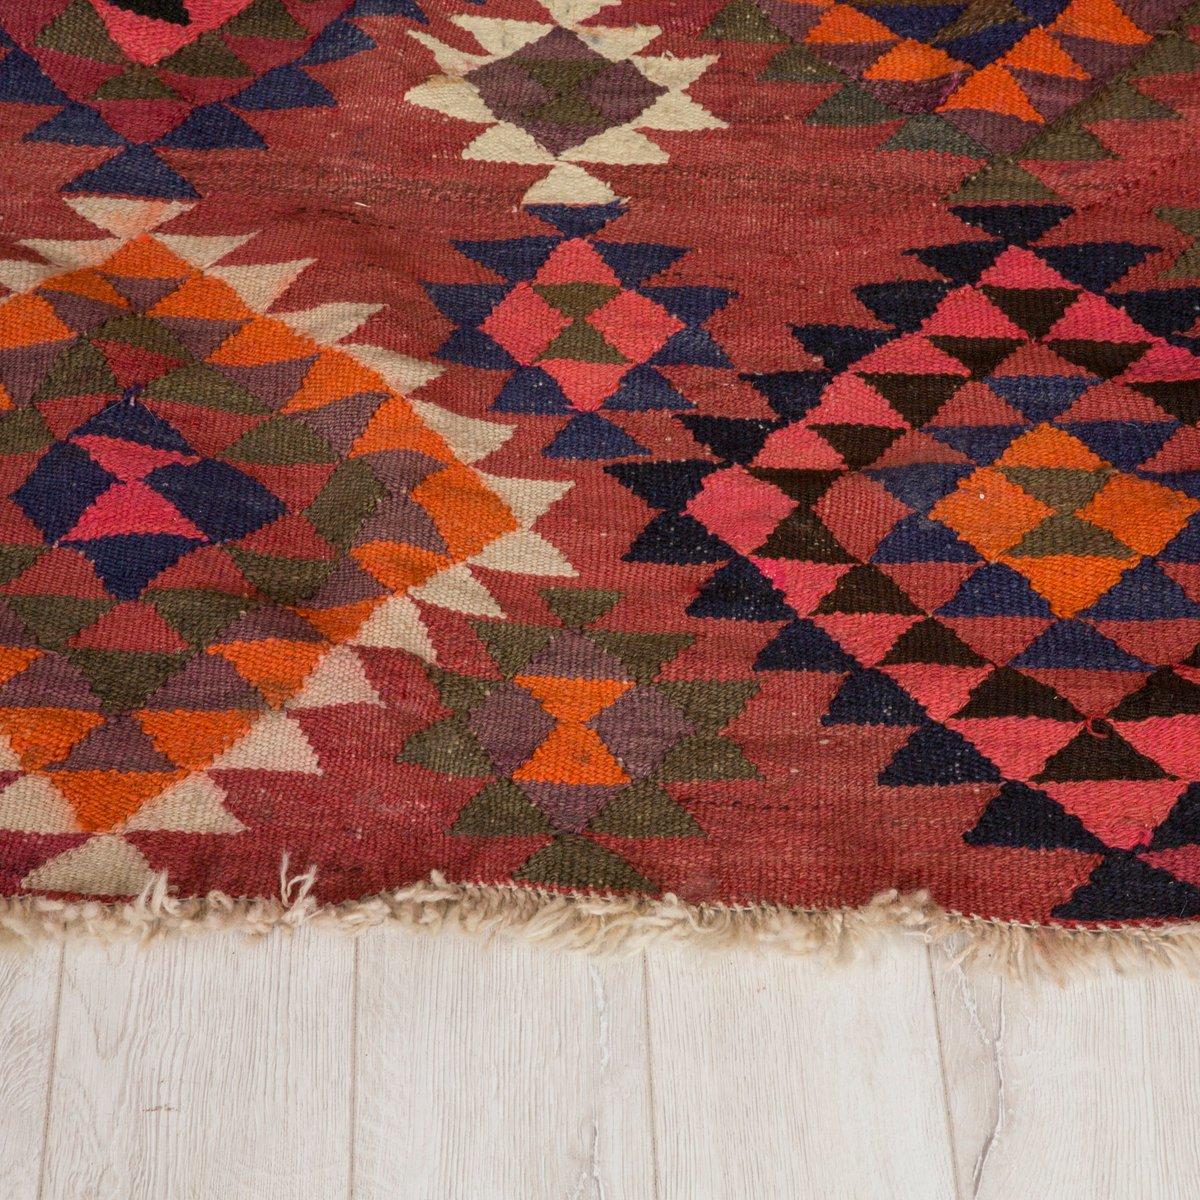 gro er vintage kilim teppich bei pamono kaufen. Black Bedroom Furniture Sets. Home Design Ideas